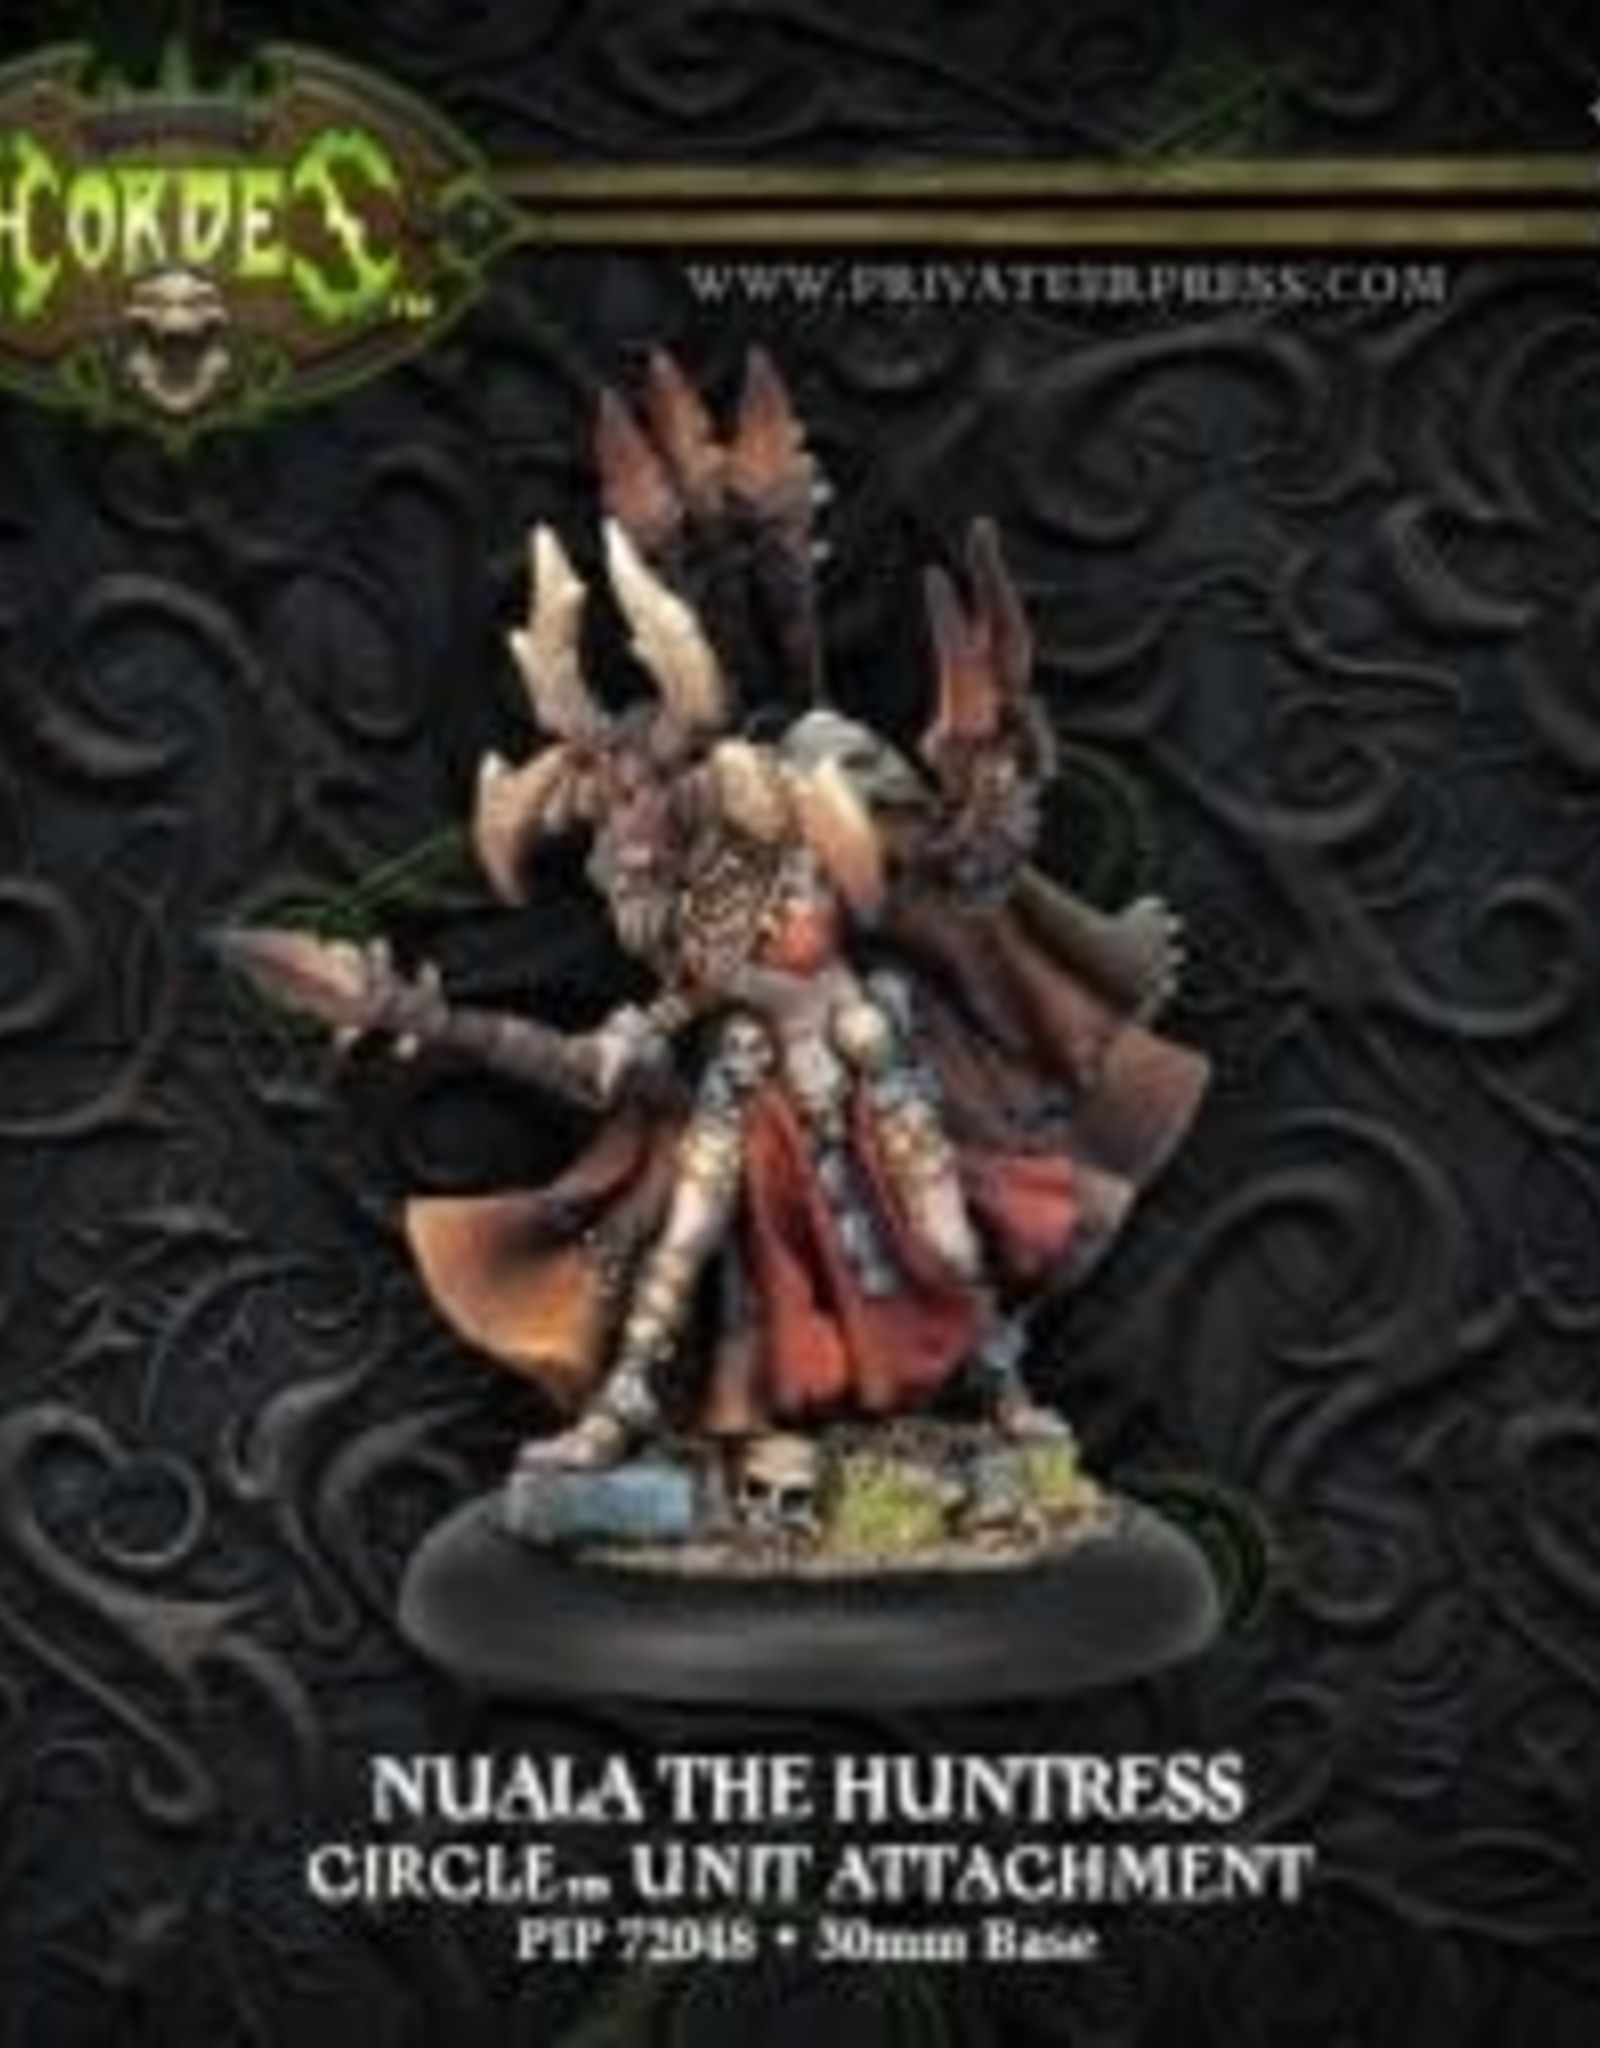 Hordes Circle - Nuala the Huntress